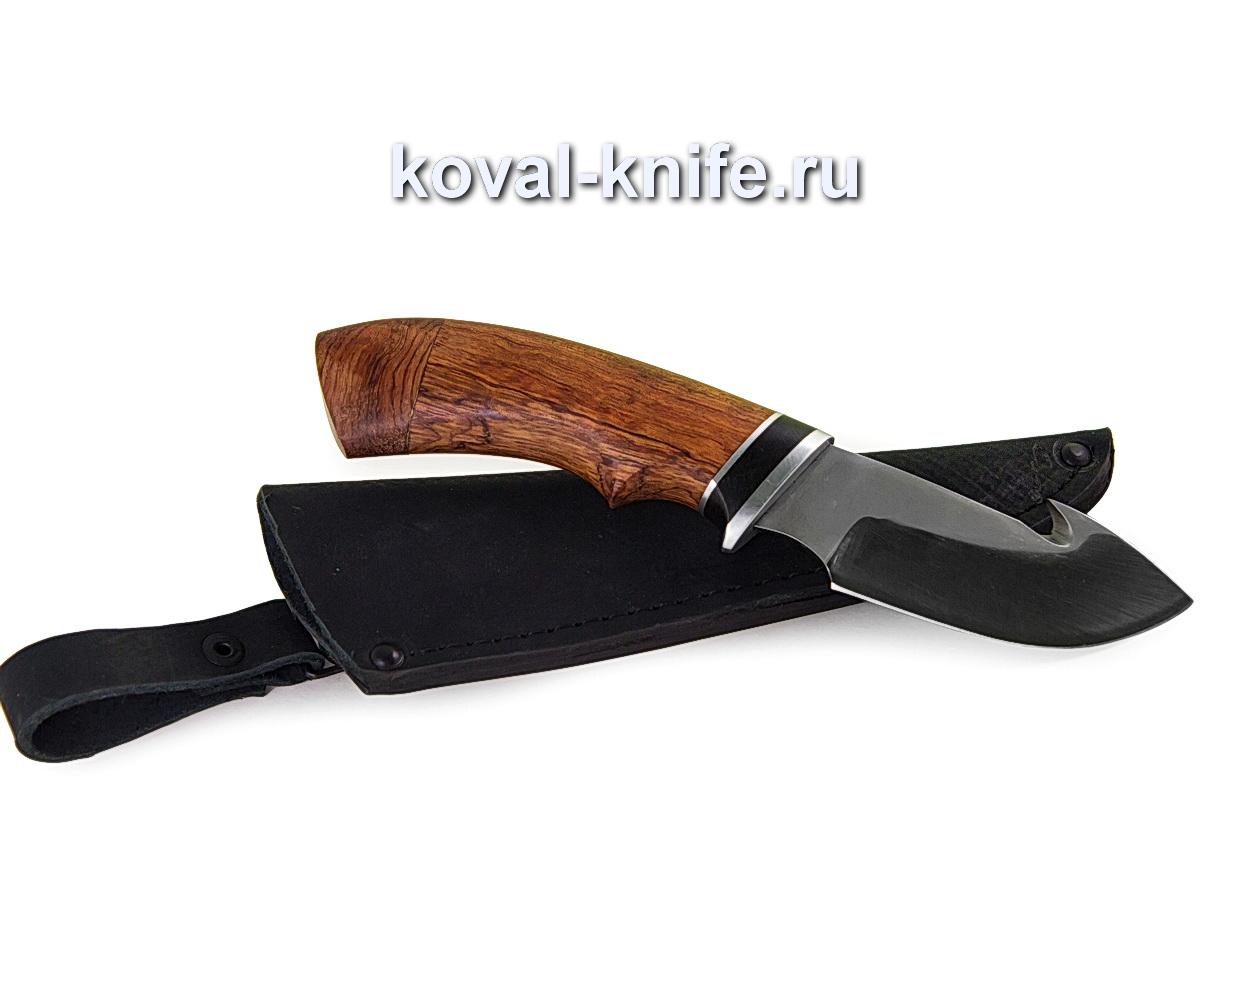 Нож Стропорез из стали У10А (рукоять орех) A362